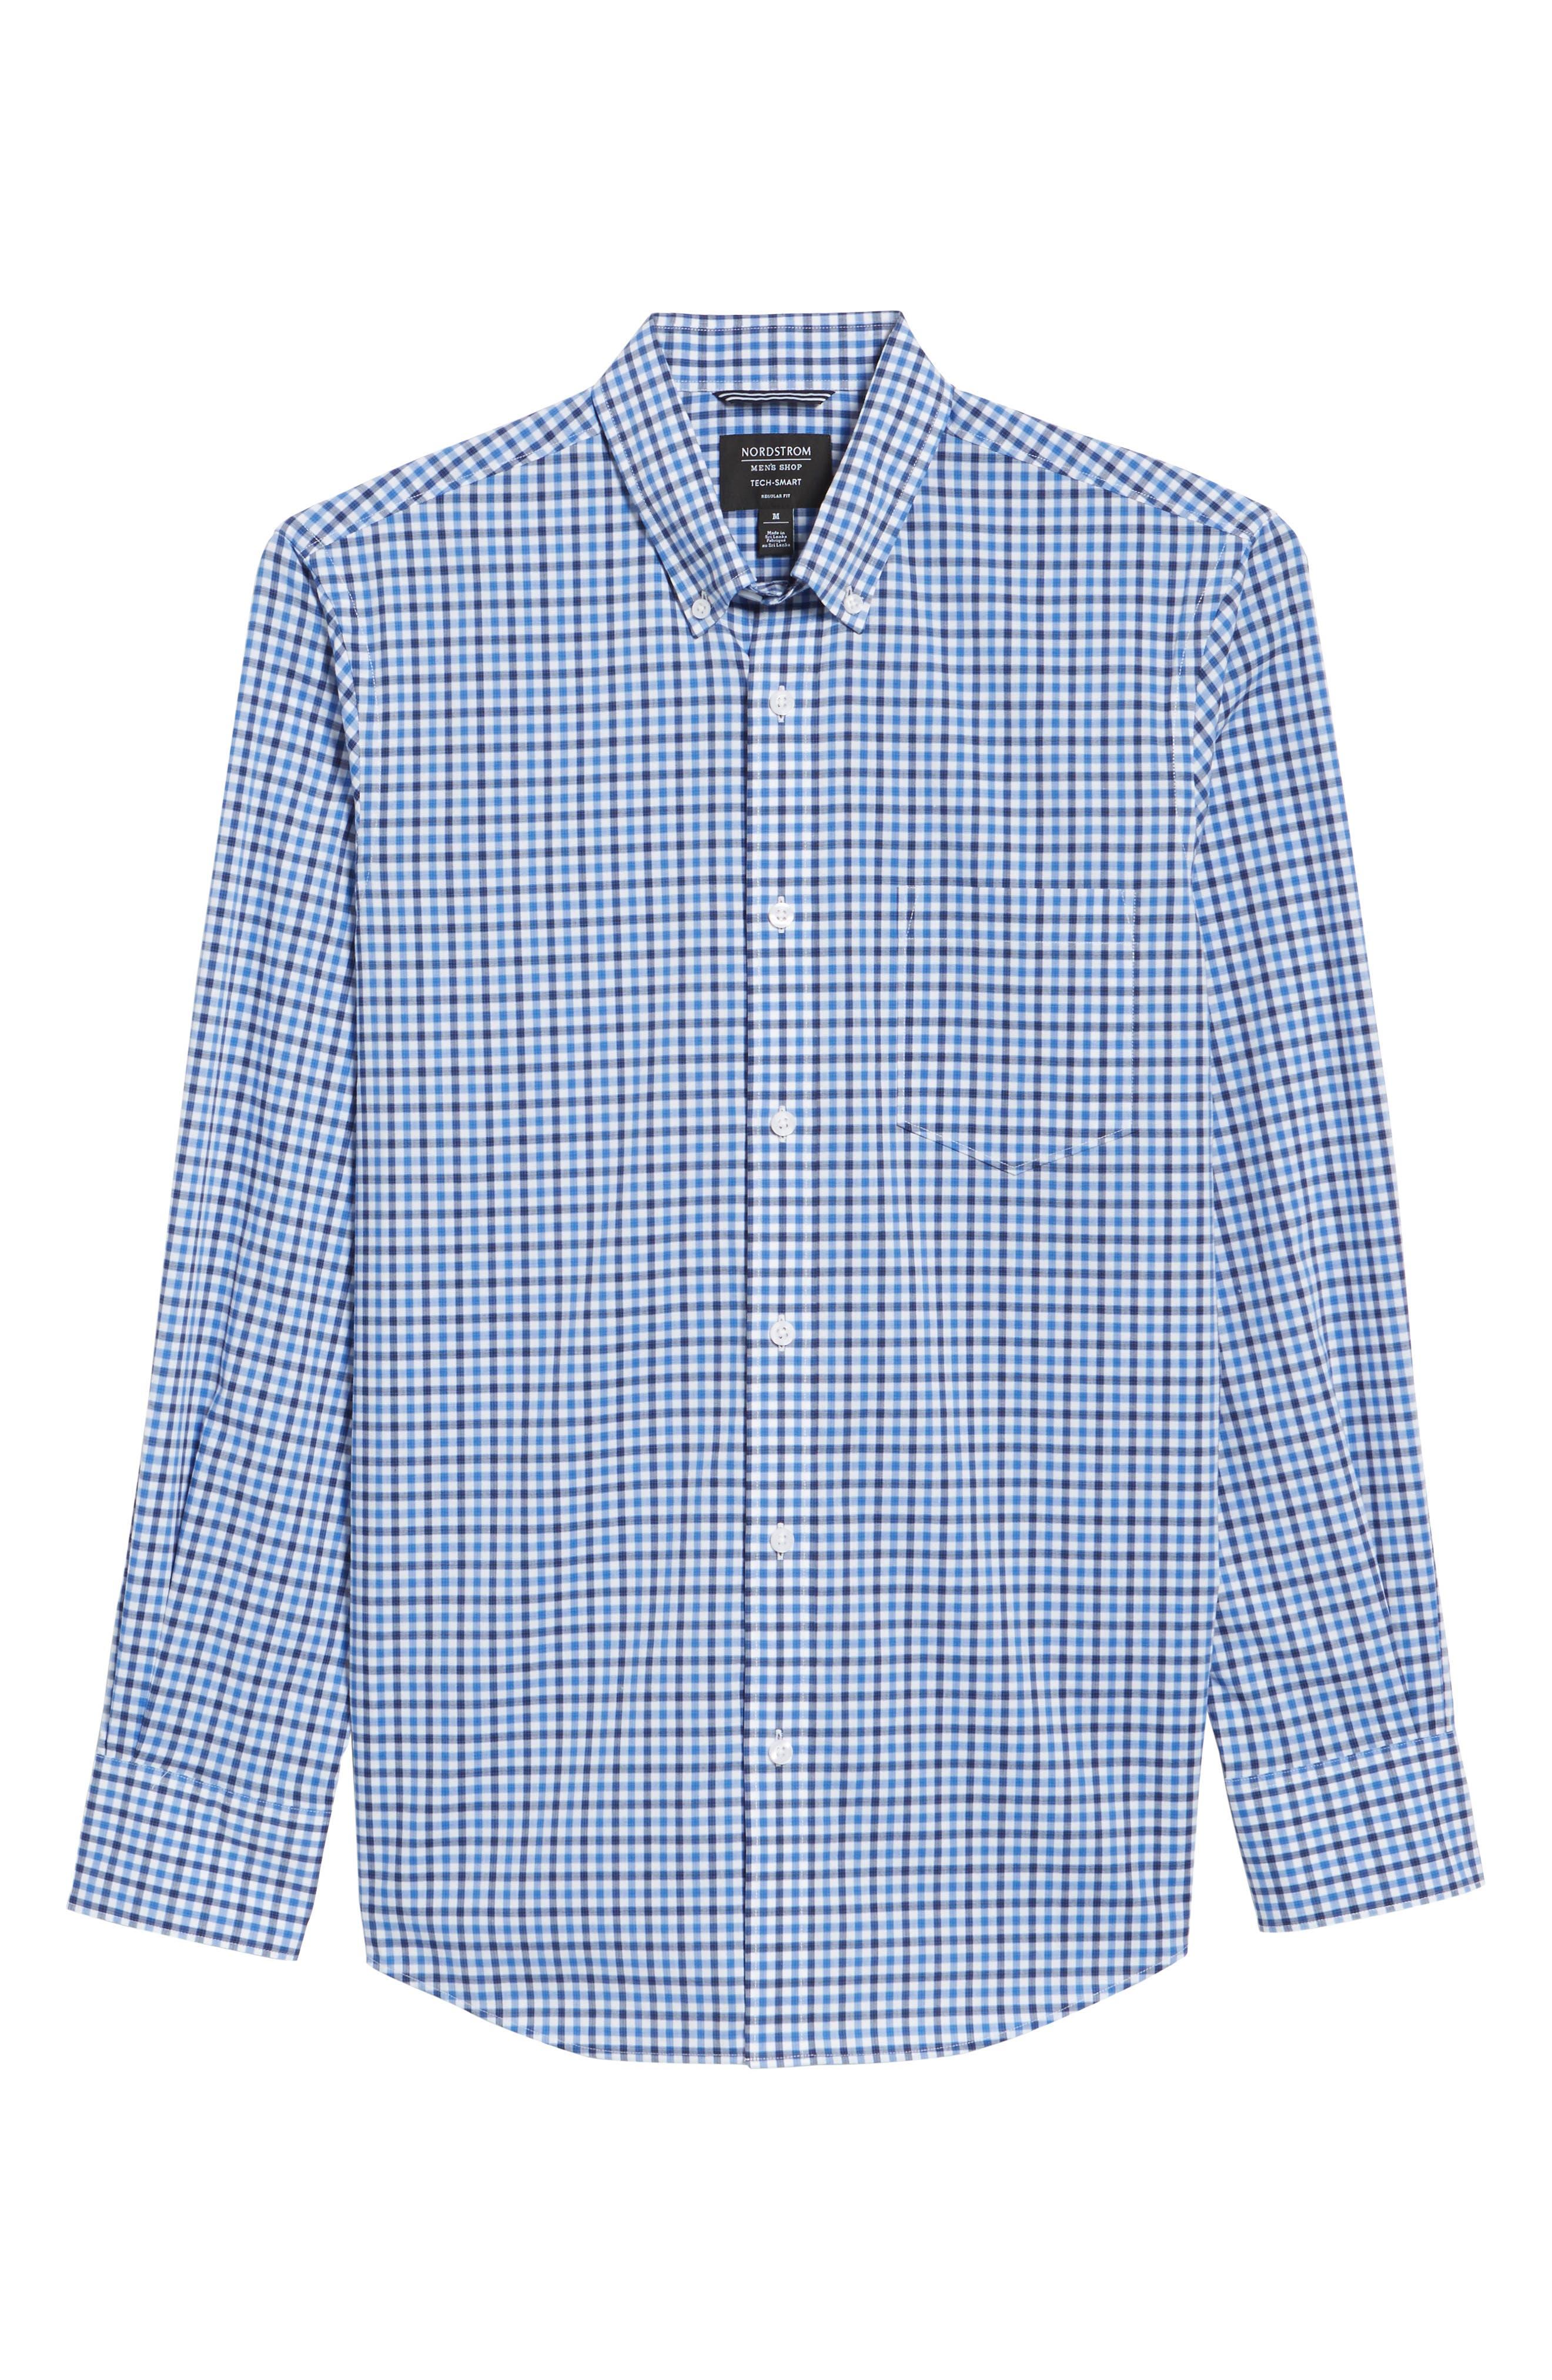 Tech-Smart Regular Fit Check Sport Shirt,                             Alternate thumbnail 6, color,                             Blue Camp Navy Check